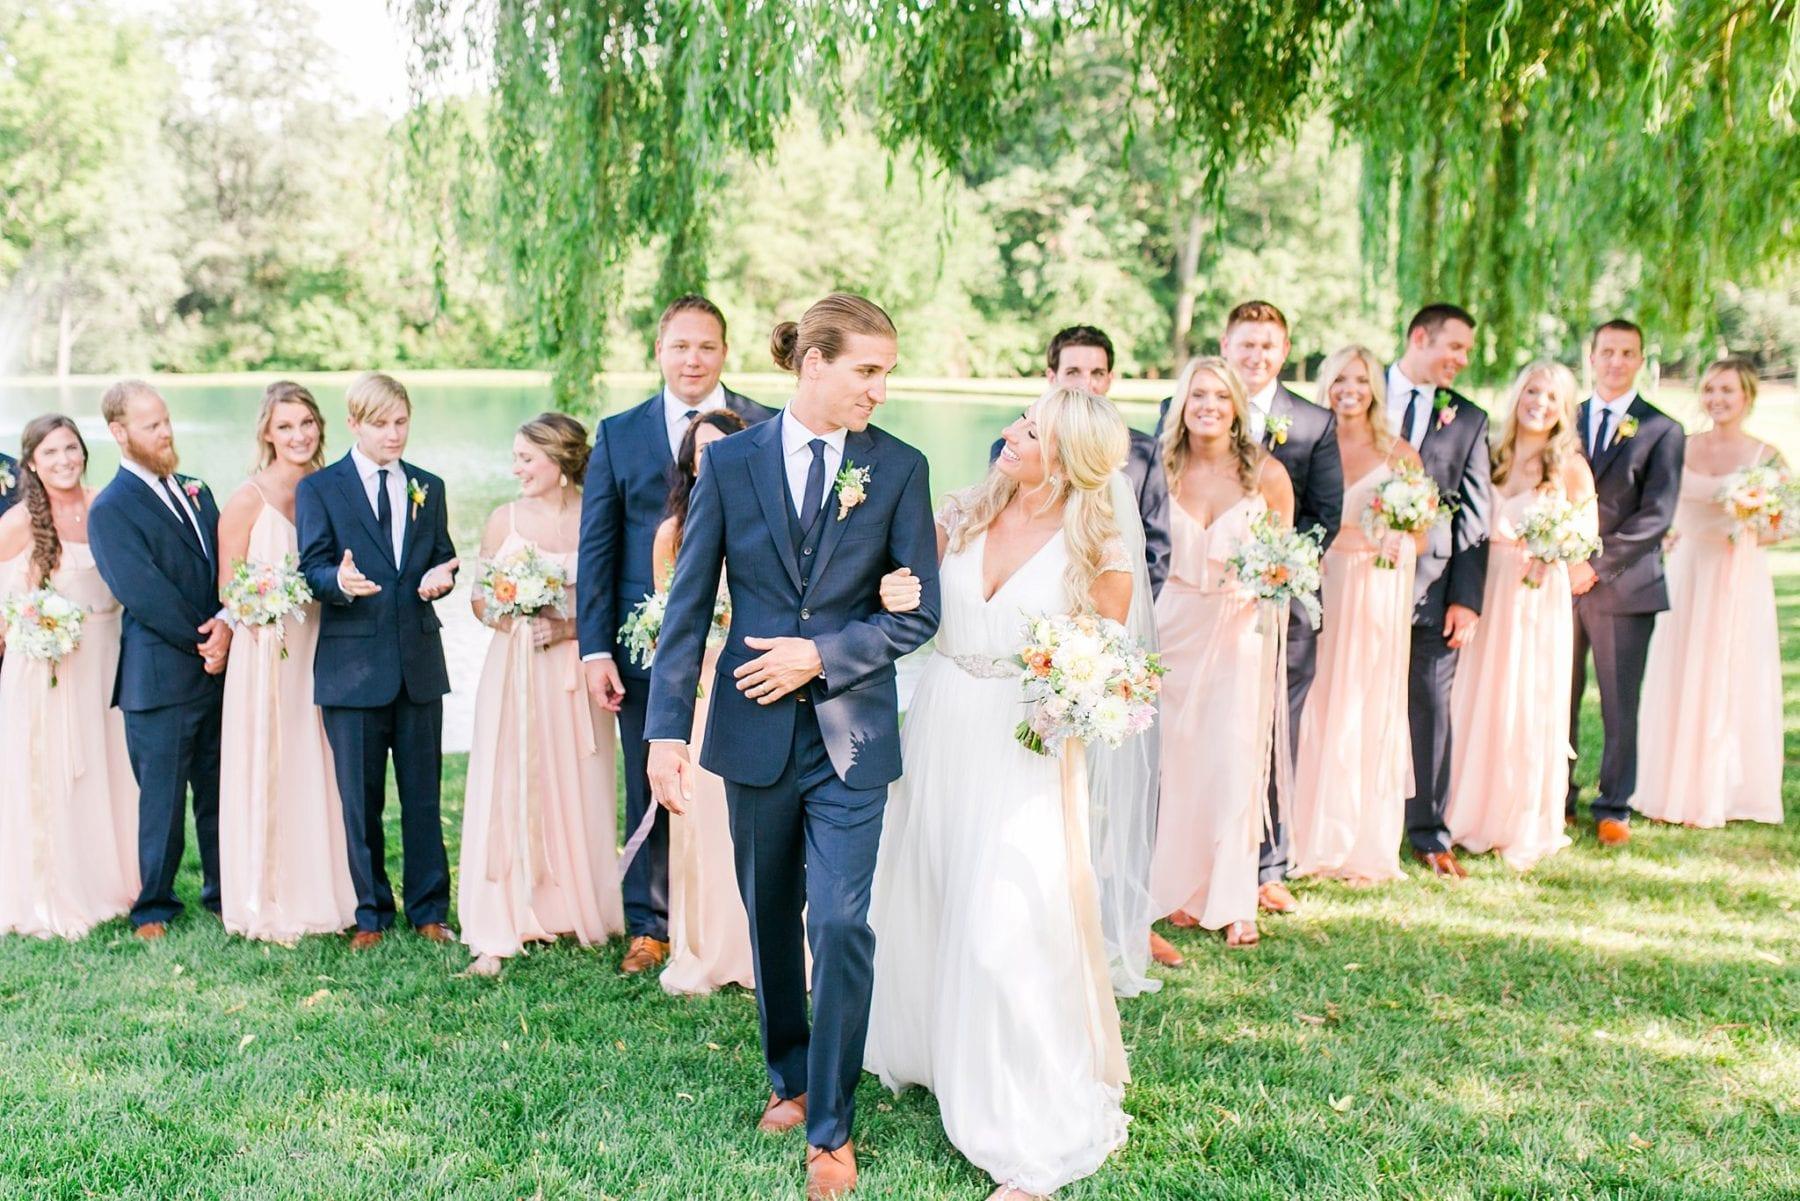 Pond View Farm Wedding Photos Maryland Wedding Photographer Kristen & Ryan Megan Kelsey Photography Blog-139.jpg